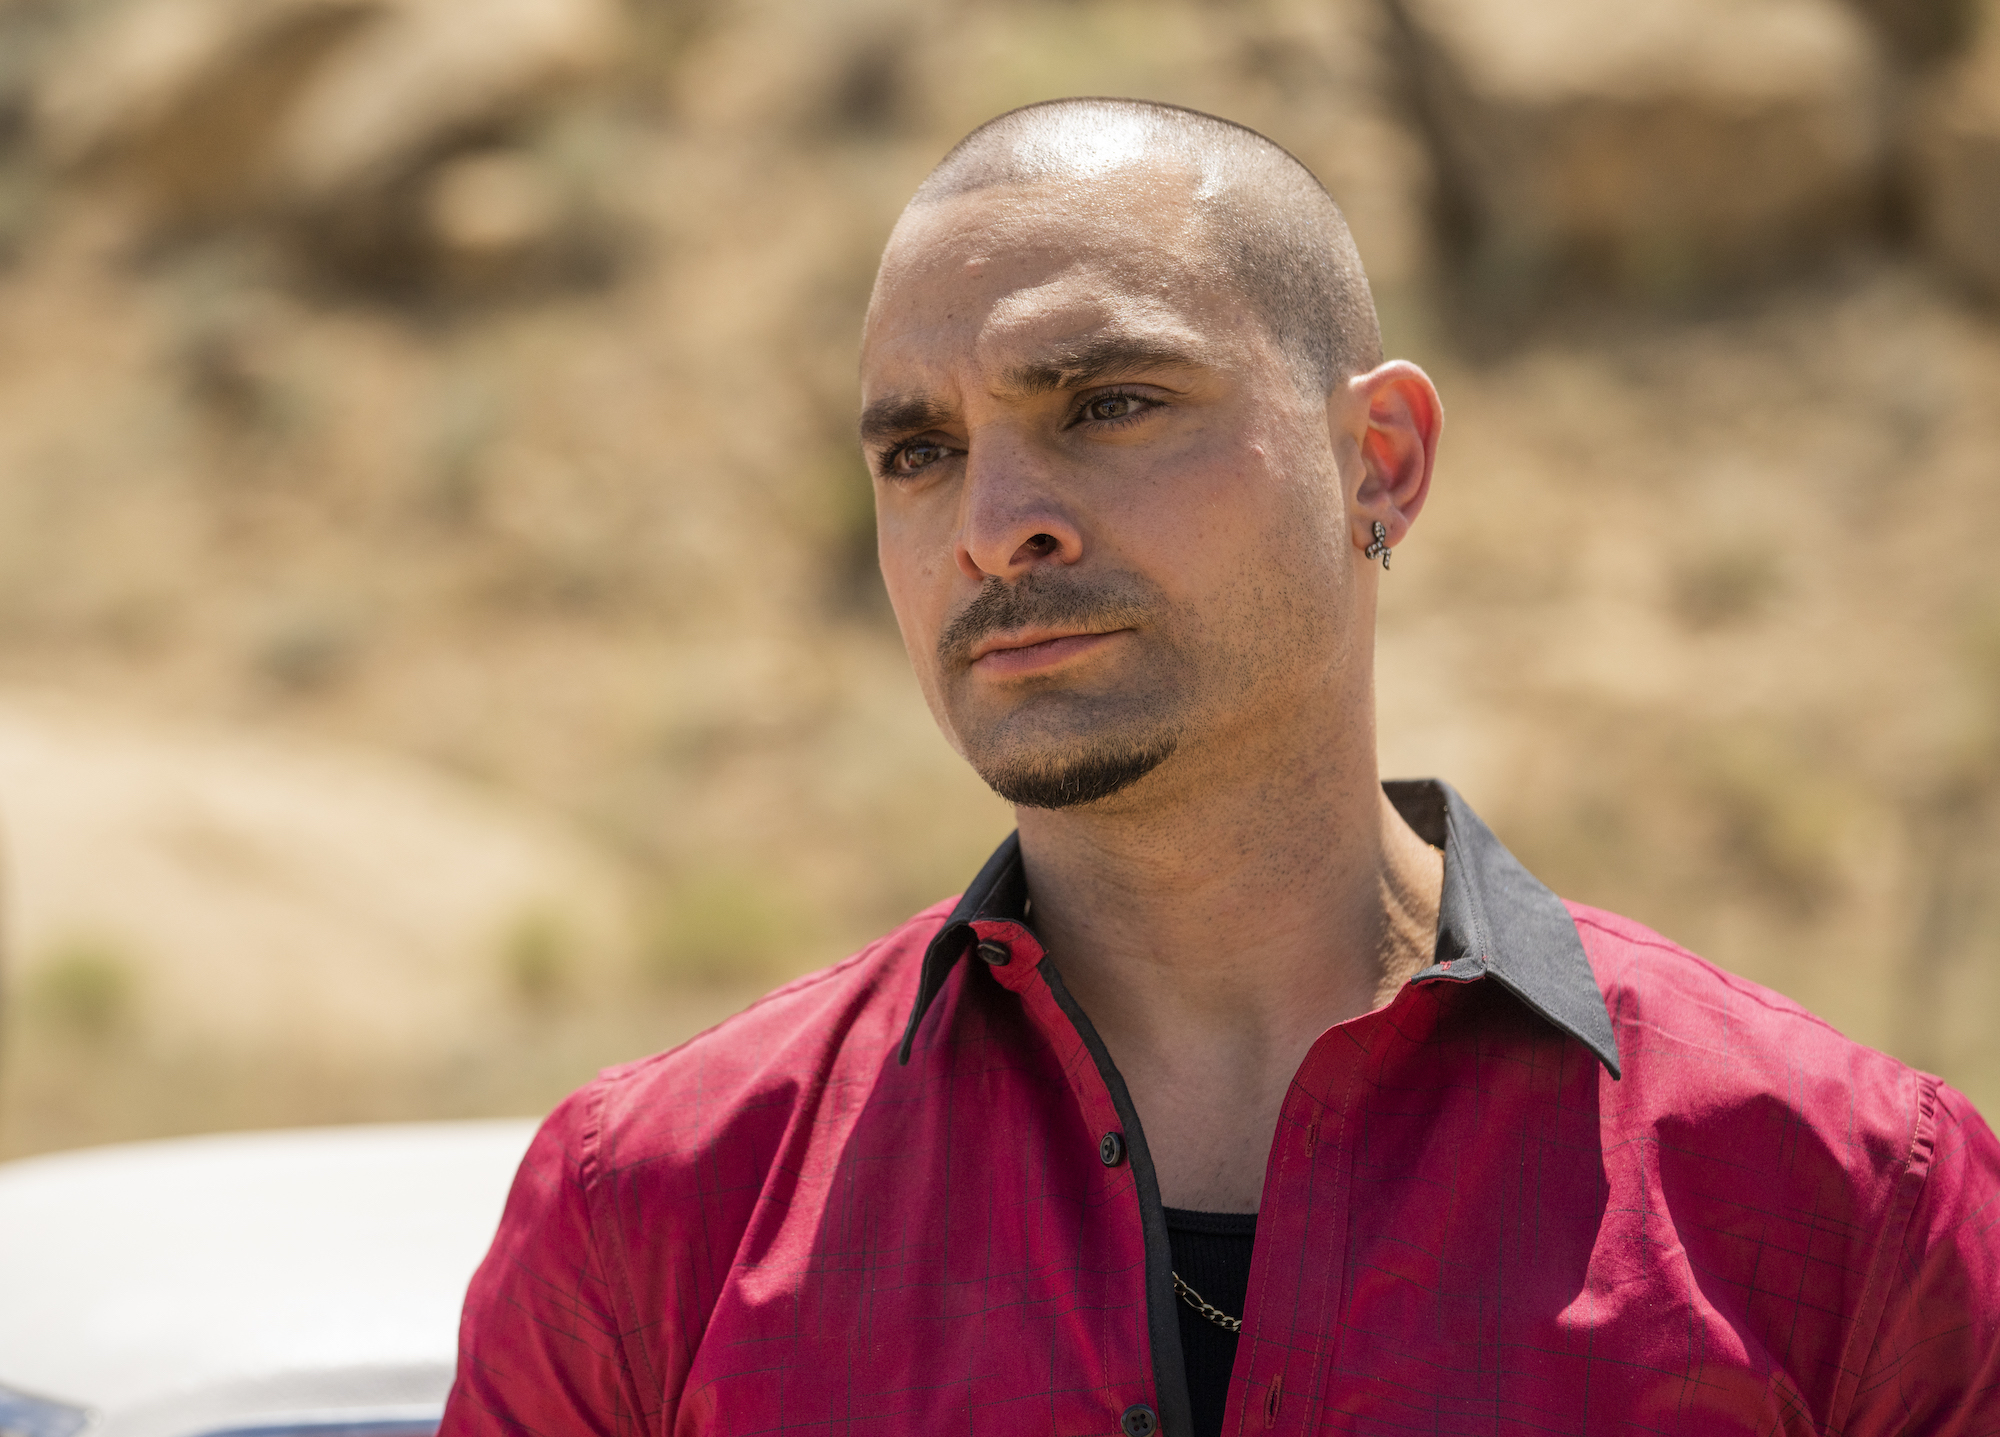 Michael Mando as Nacho Varga - Better Call Saul _ Season 5, Episode 9 - Photo Credit: Greg Lewis/AMC/Sony Pictures Television